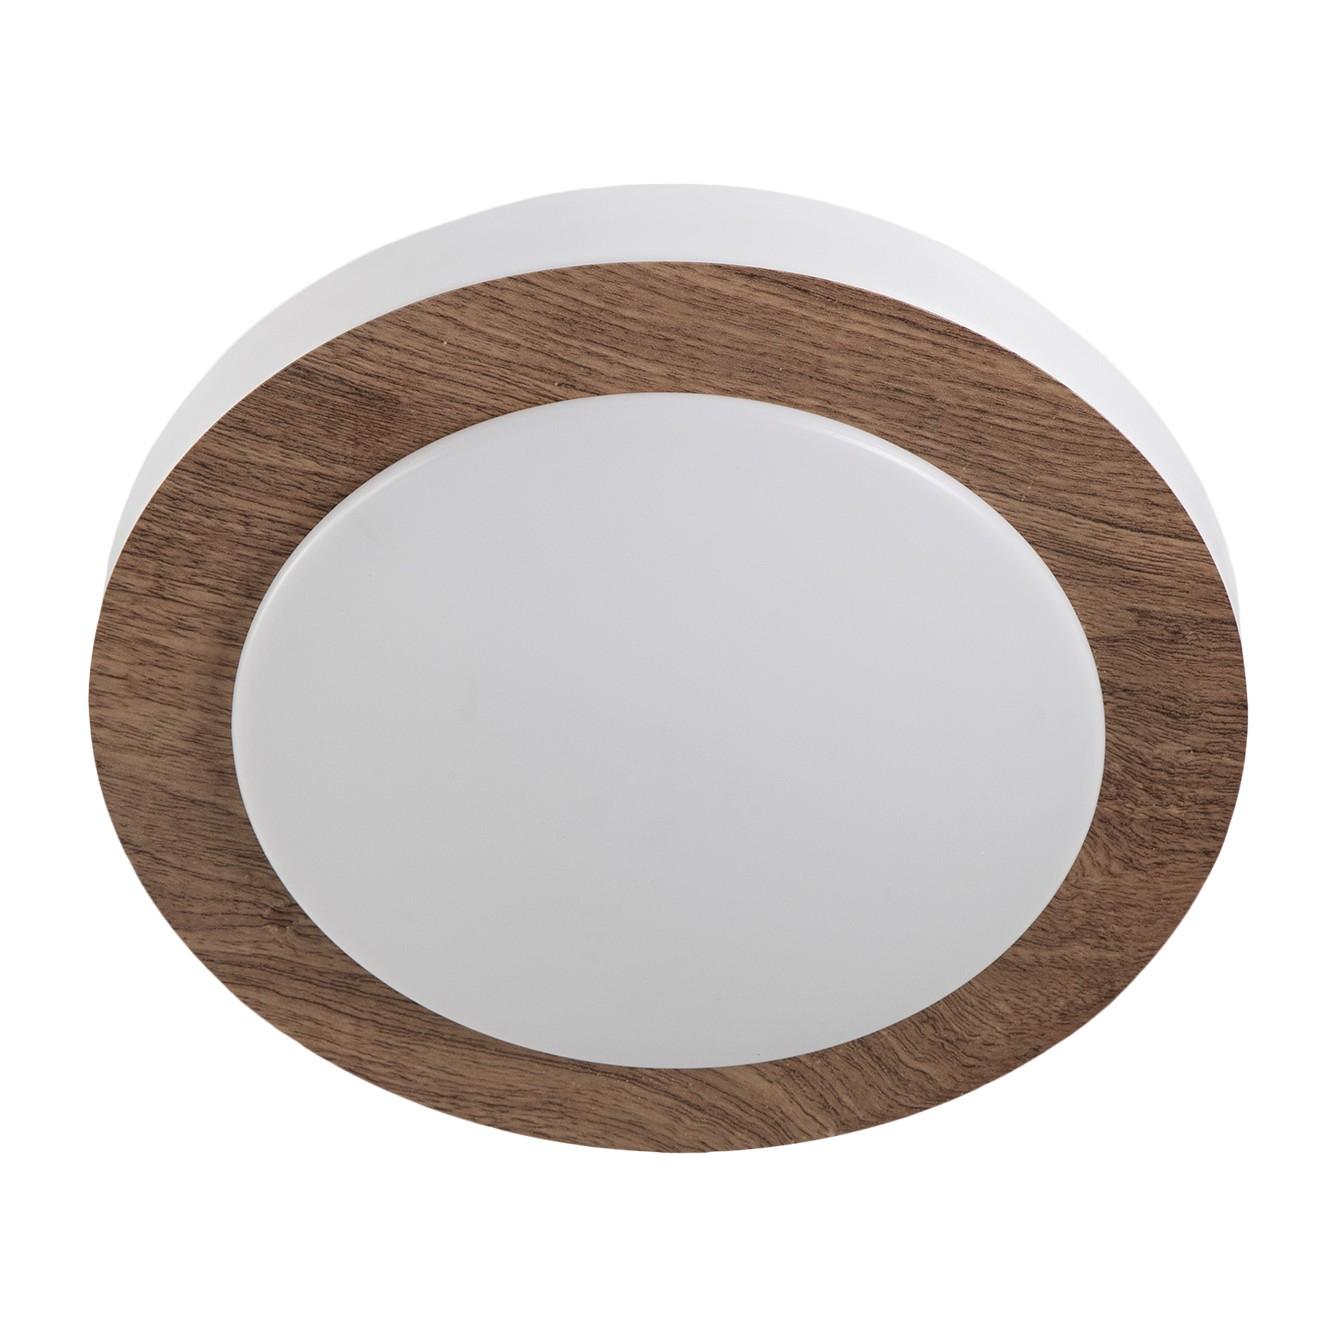 LED-Deckenleuchte Gordon Circle